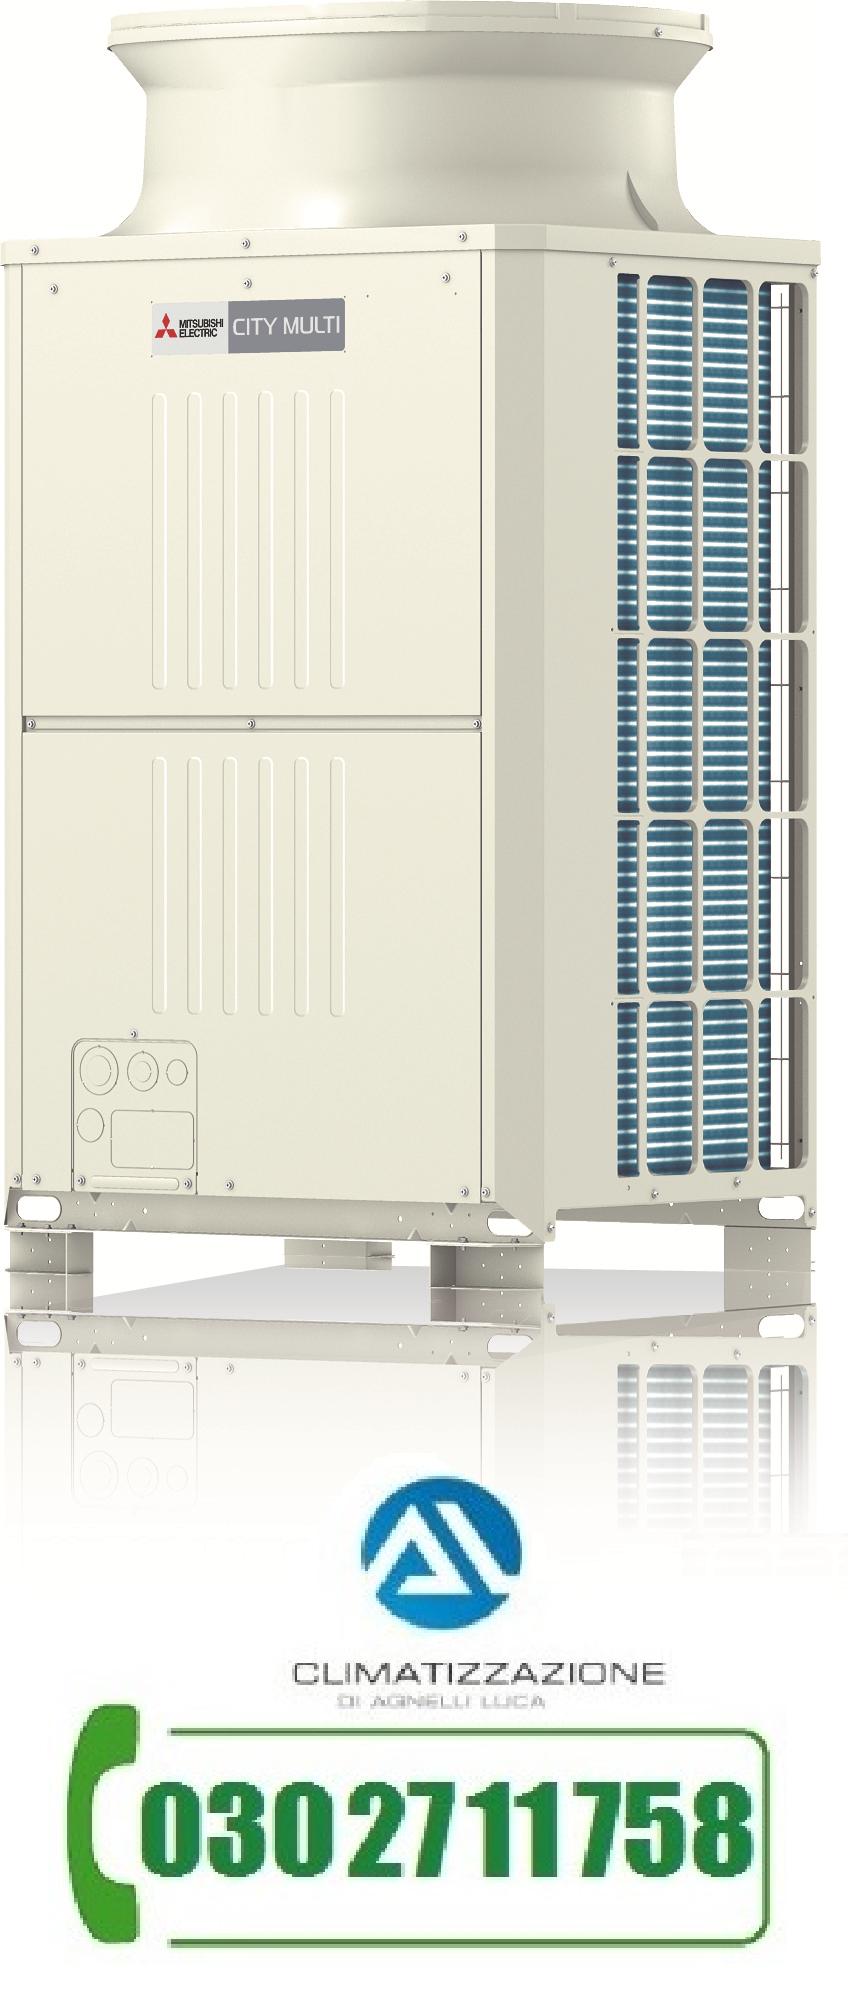 VRF Mitsubishi Electric TEL.0302711758